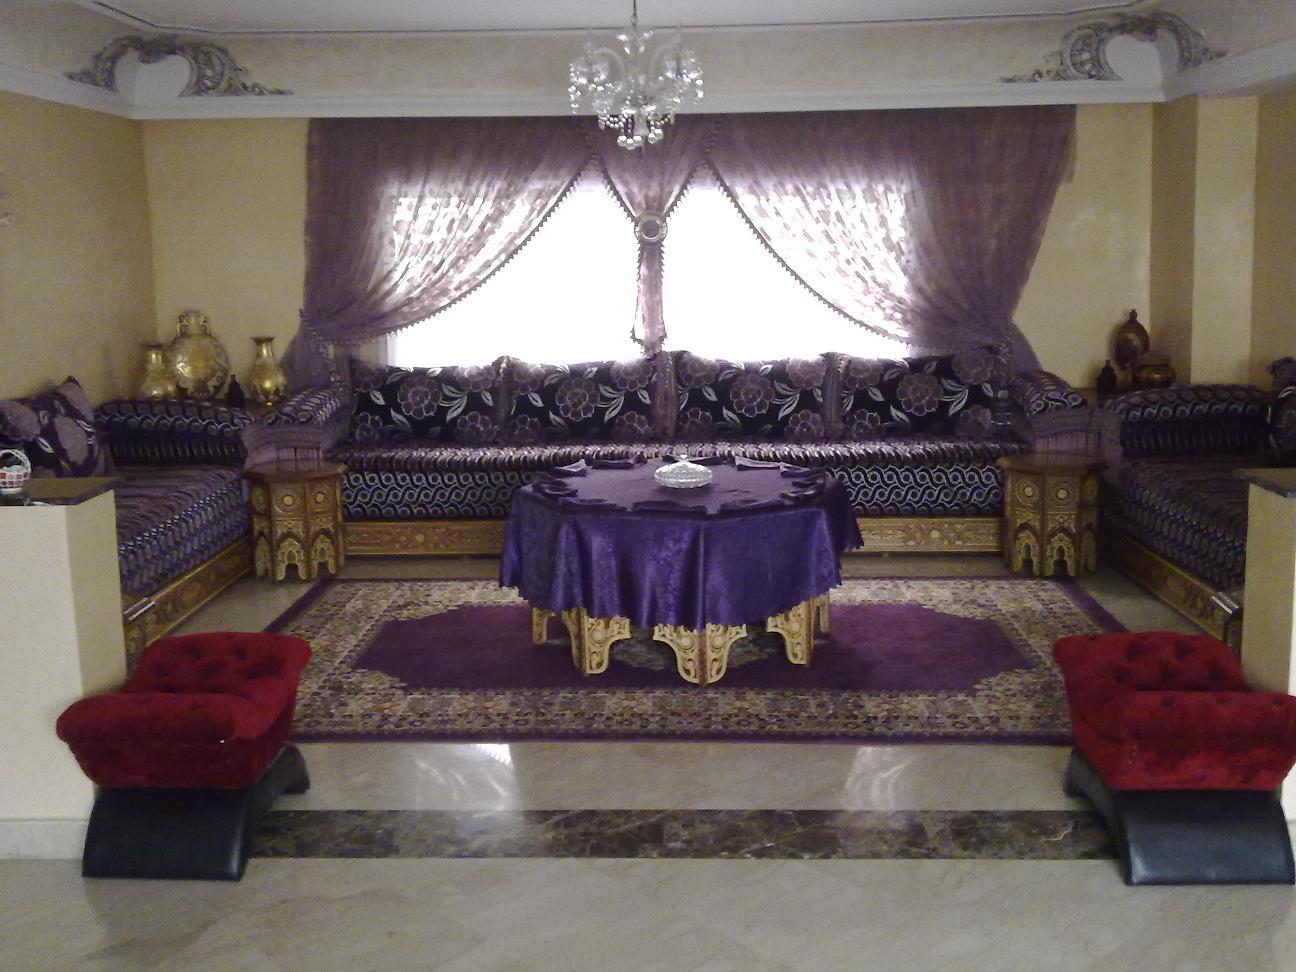 Vente Duplex à Bd Abdelmoumen casablanca Maroc